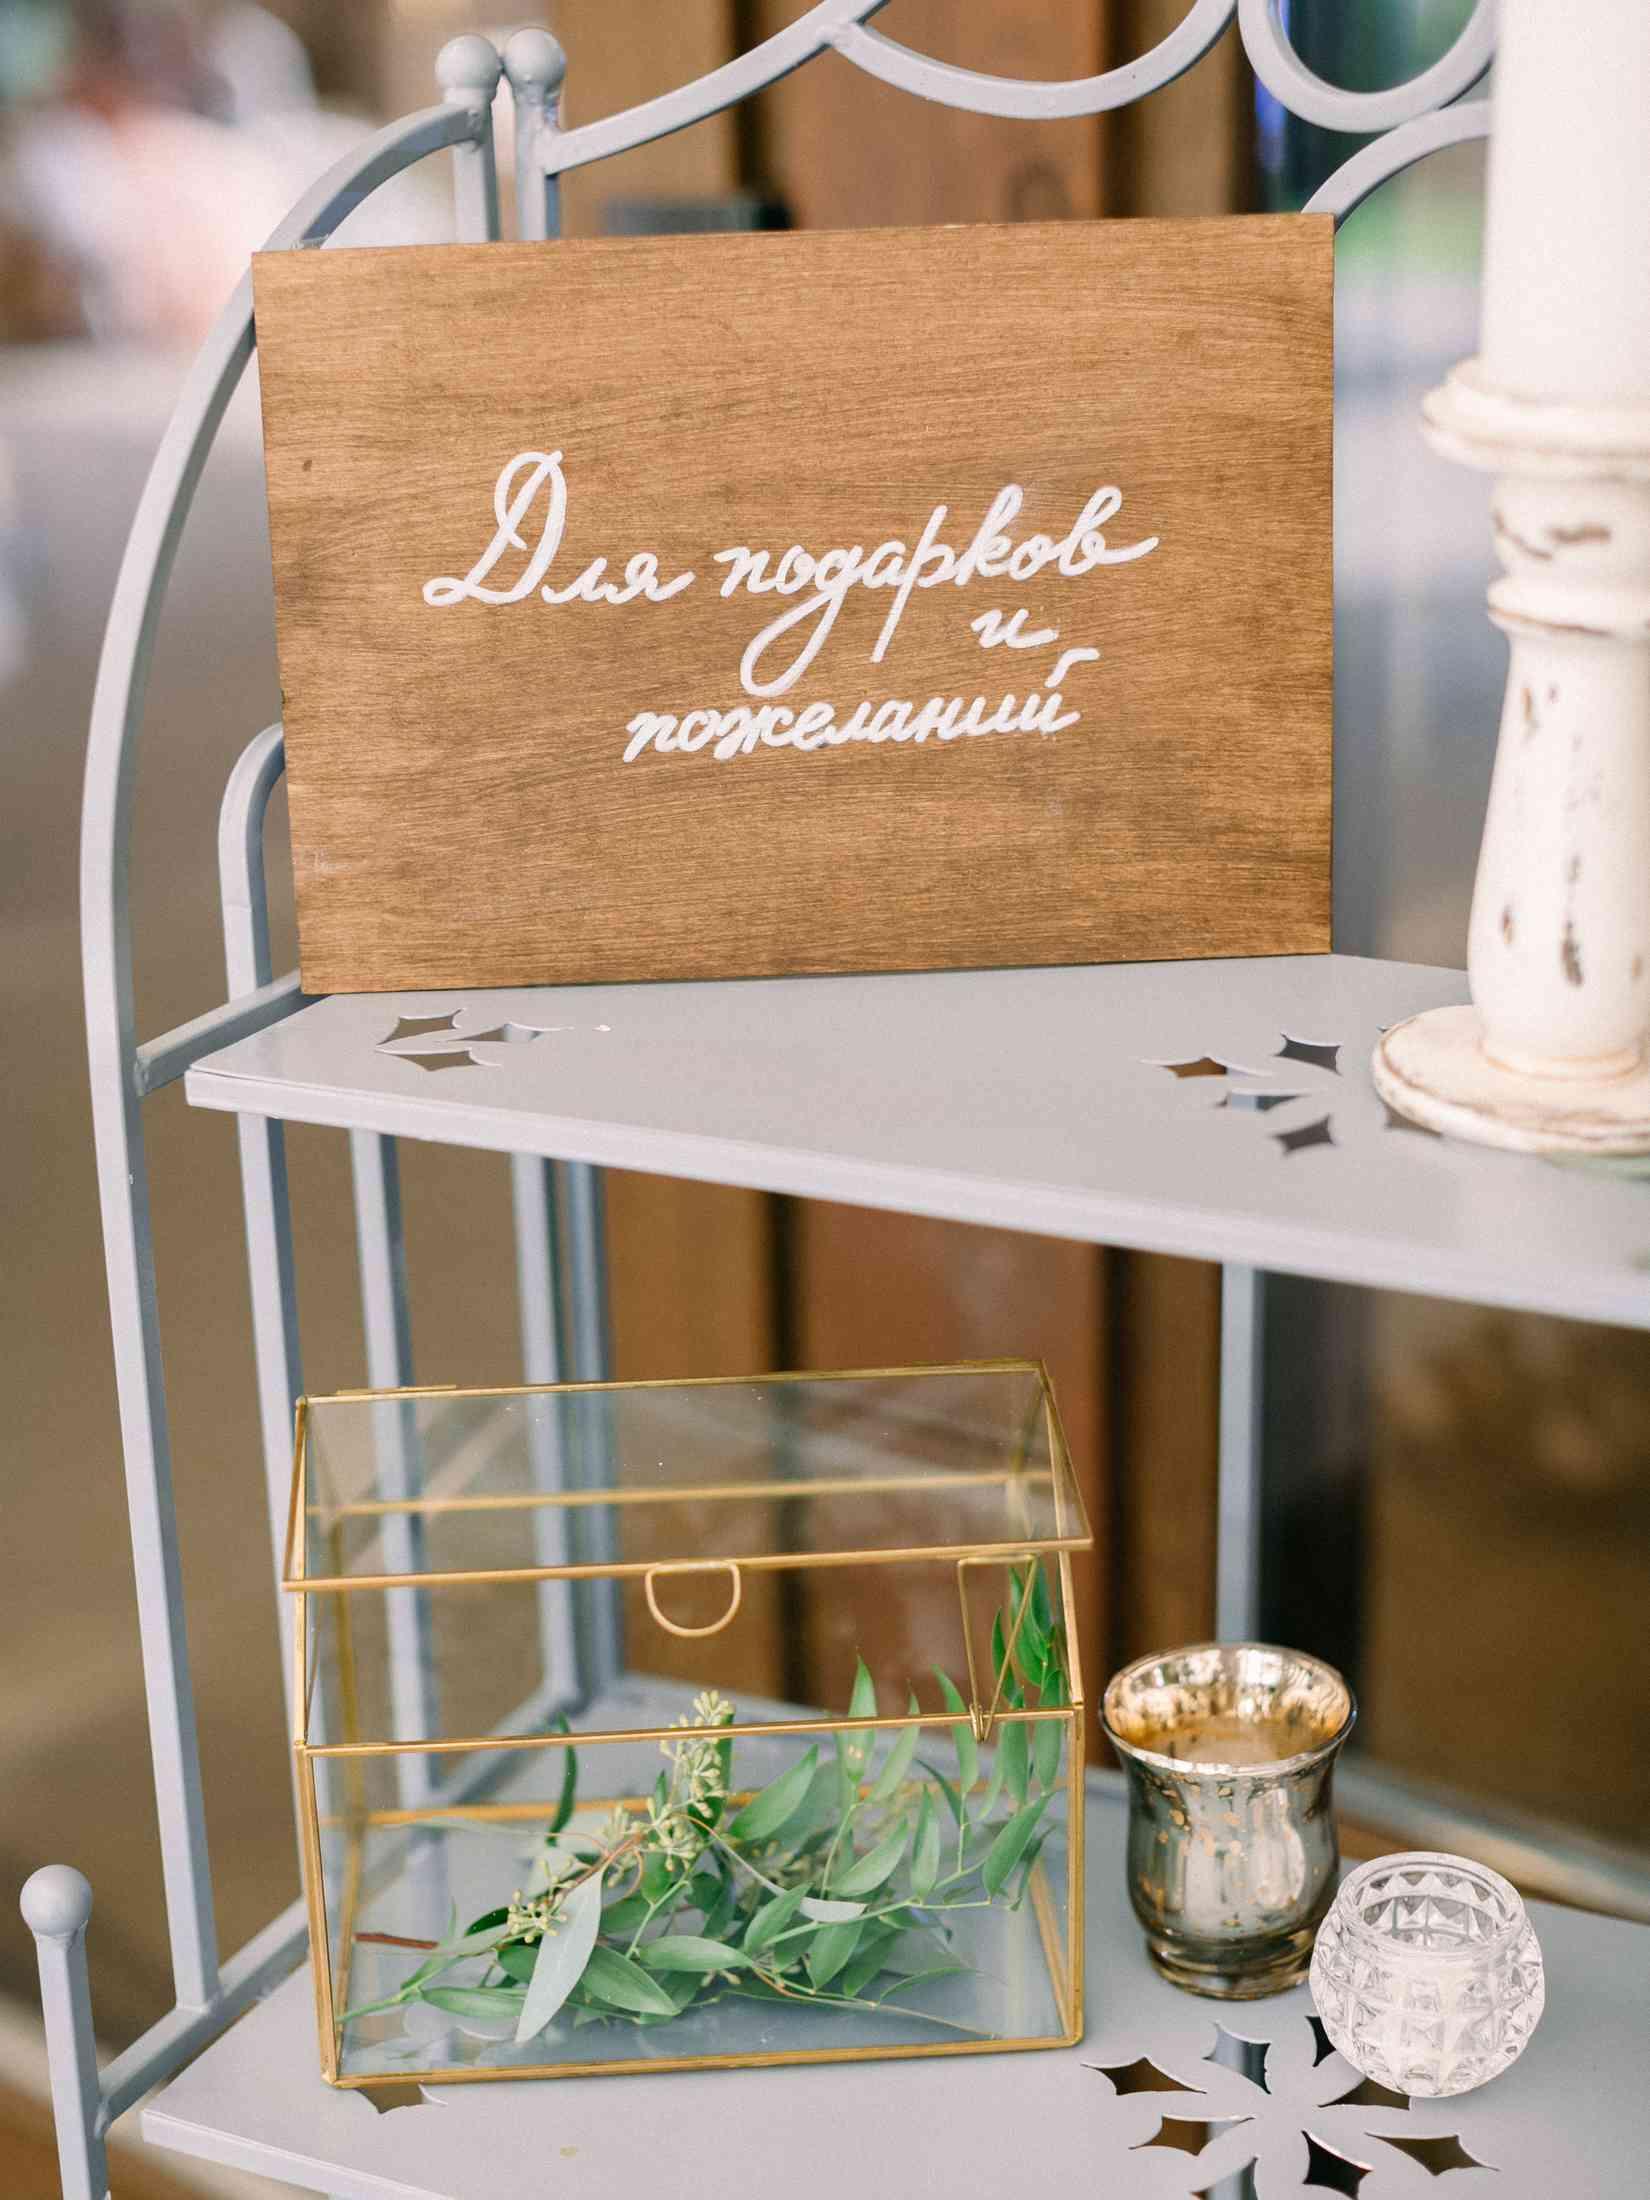 зона подарков на свадьбе идеи